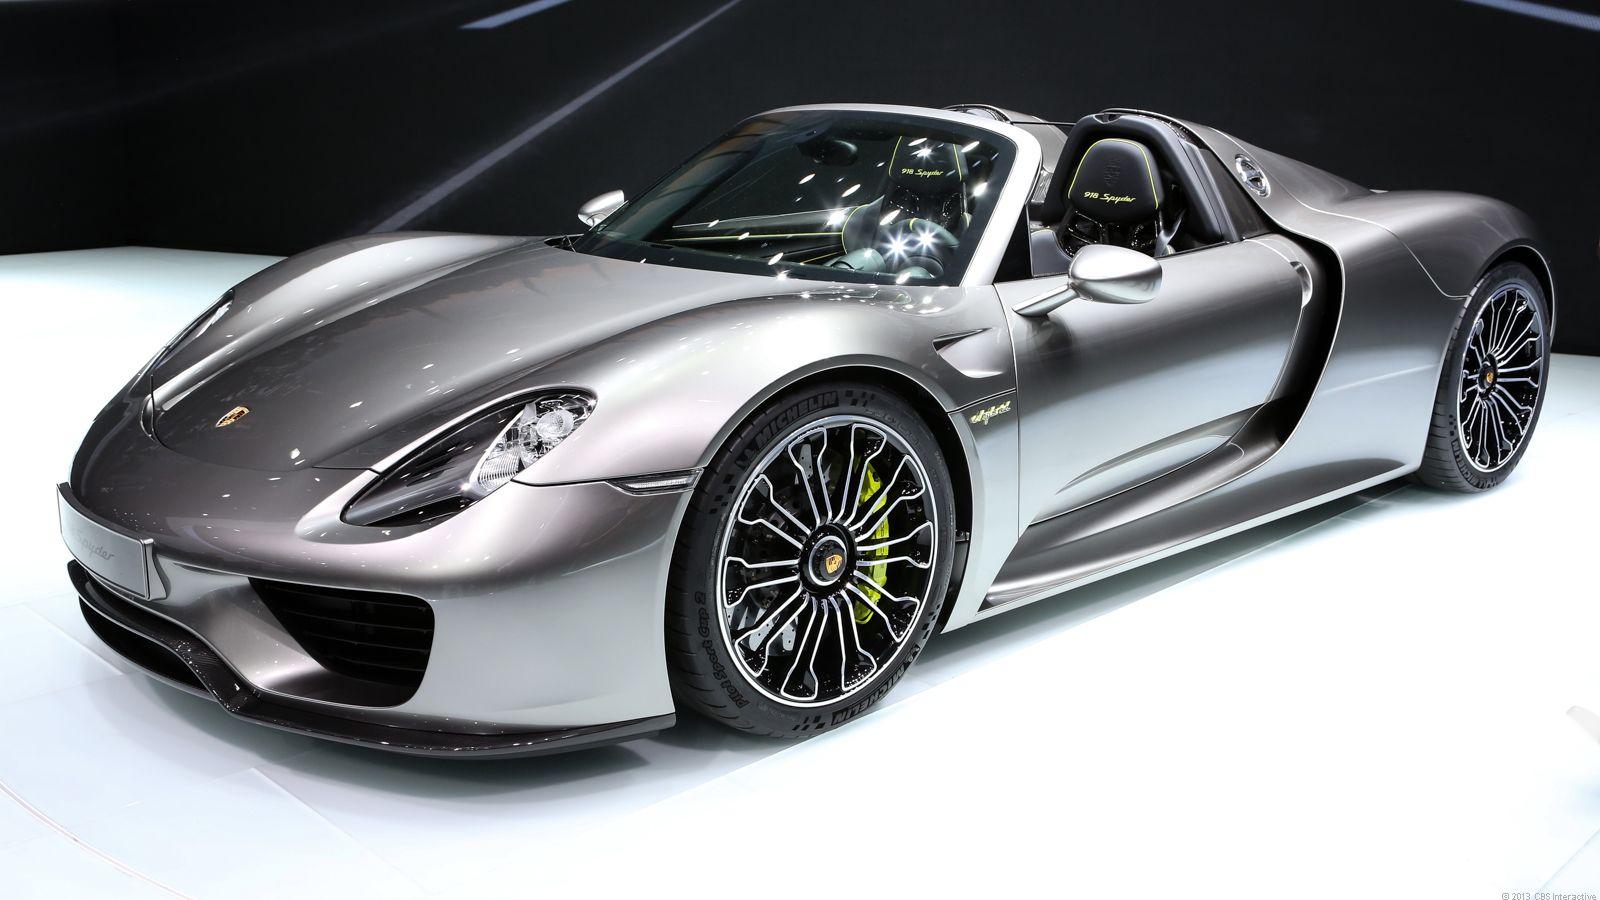 2001 Porsche 911 Fuse Box Diagram 918 Spyder 2016 Is A Hybrid Hypercar Pictures Cars The Rh Pinterest Com